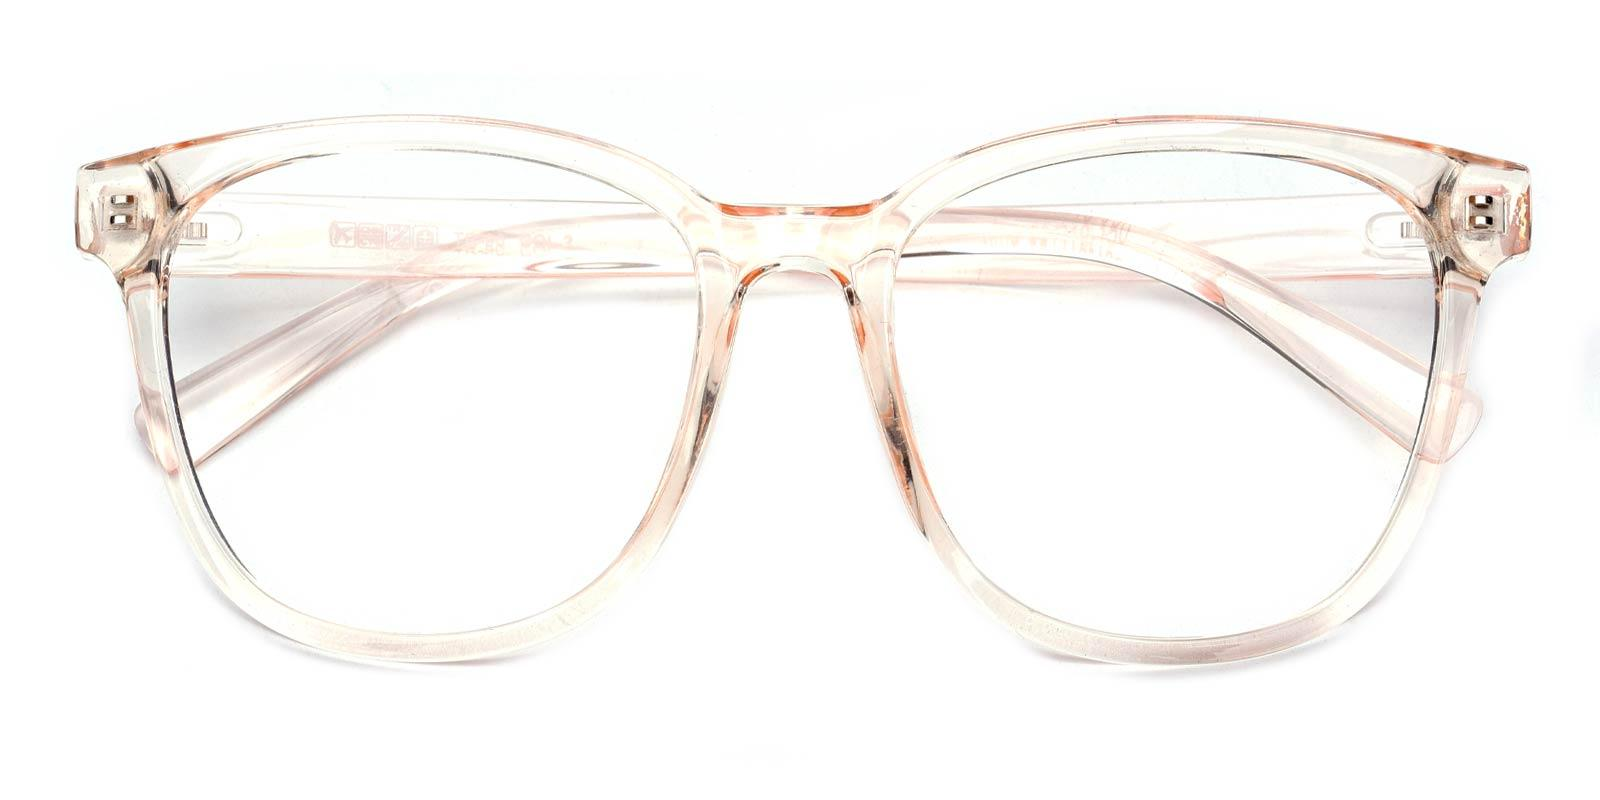 Edgar-Orange-Square-TR-Eyeglasses-detail